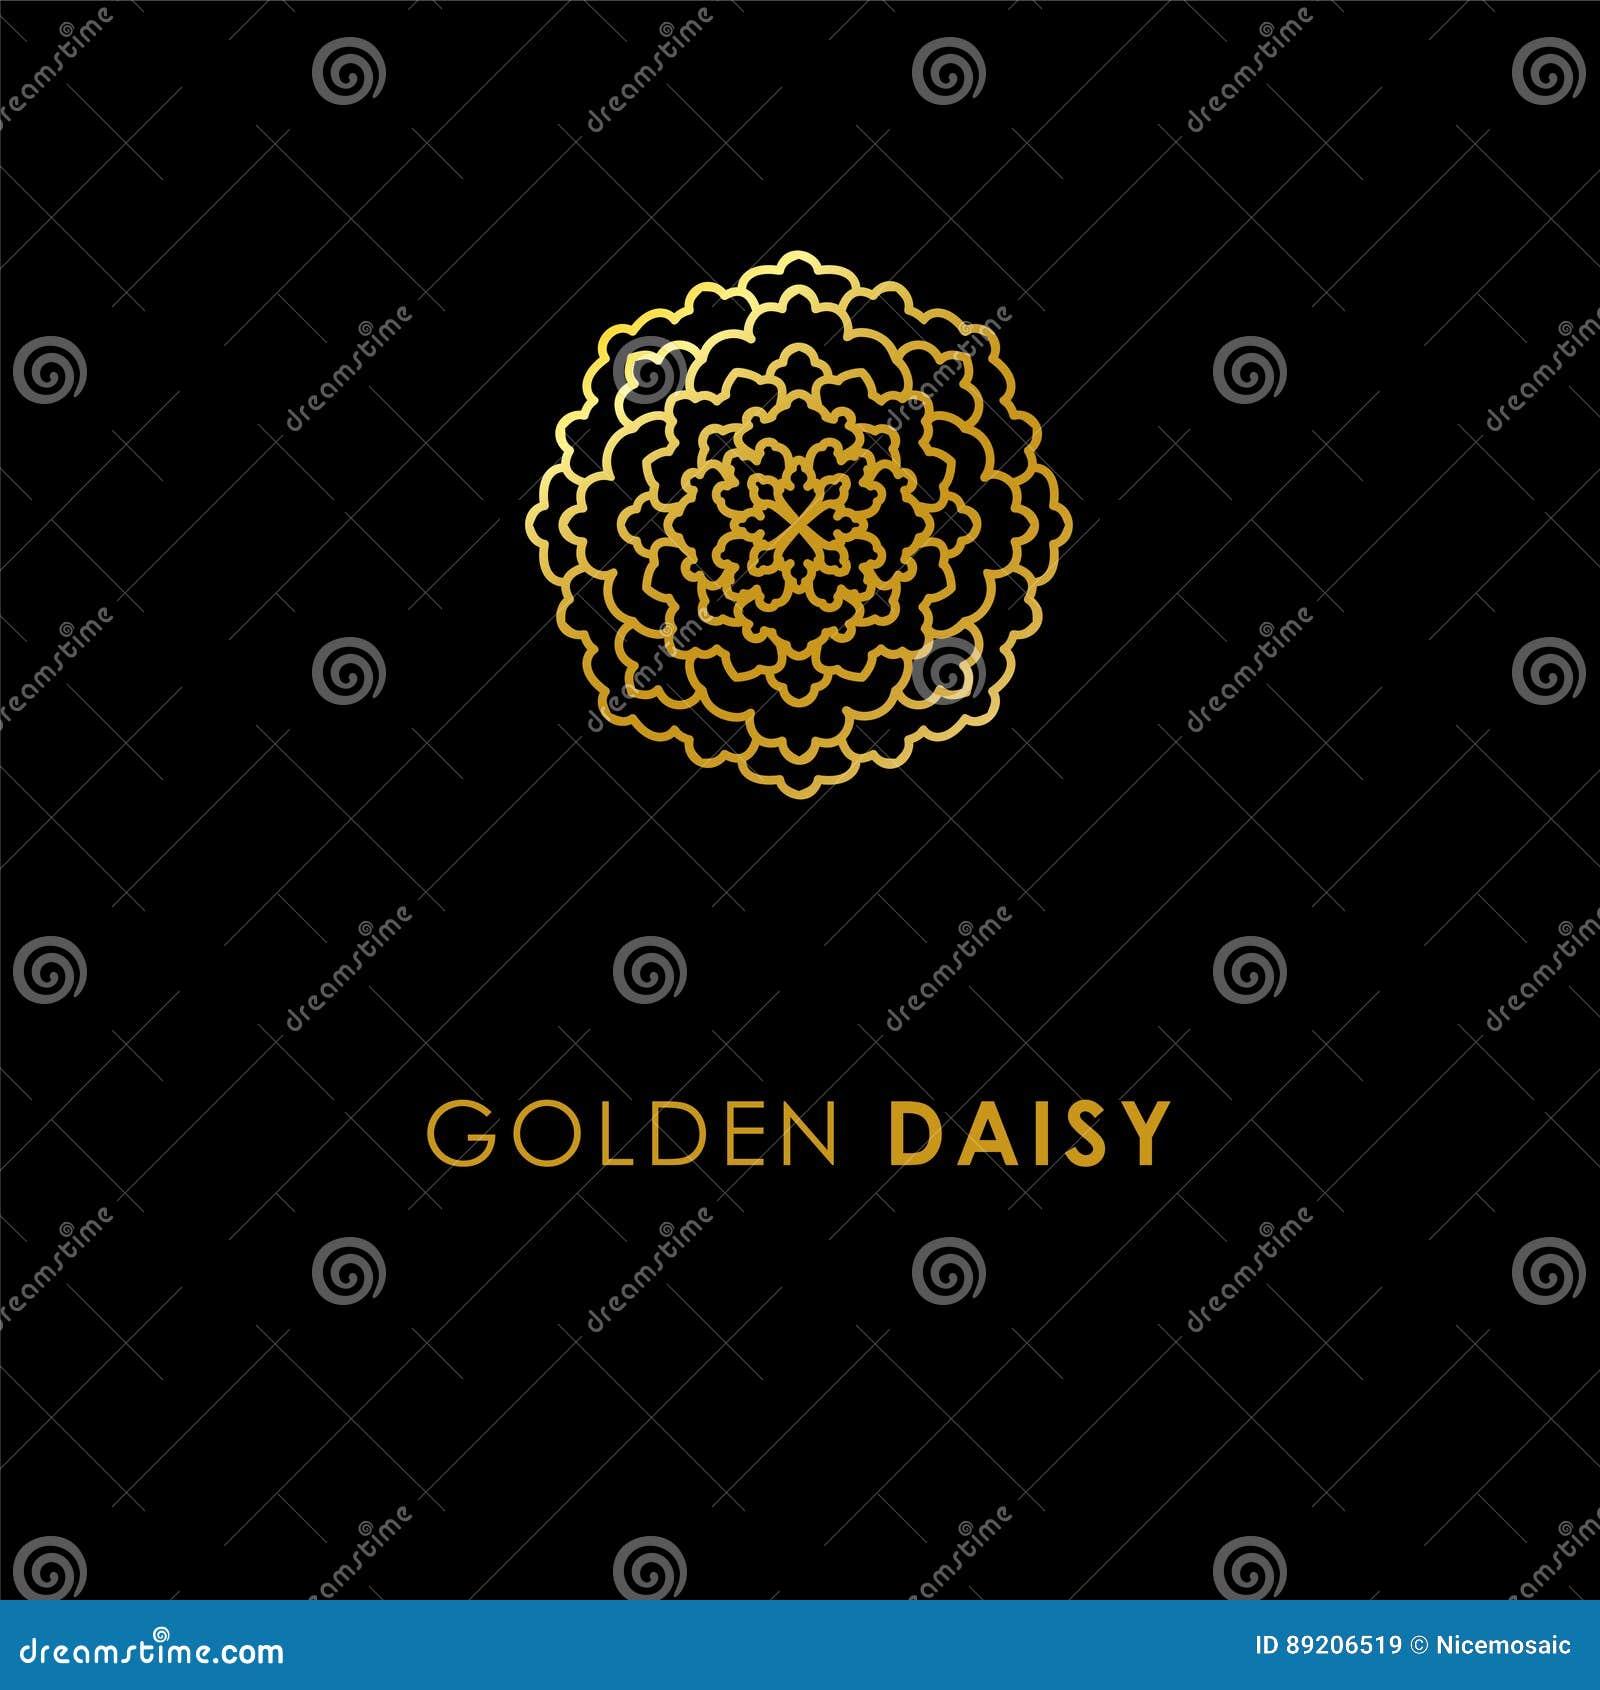 Abstract flower logo icon design elegant golden daisy symbol t abstract flower logo icon design elegant golden daisy symbol t biocorpaavc Choice Image